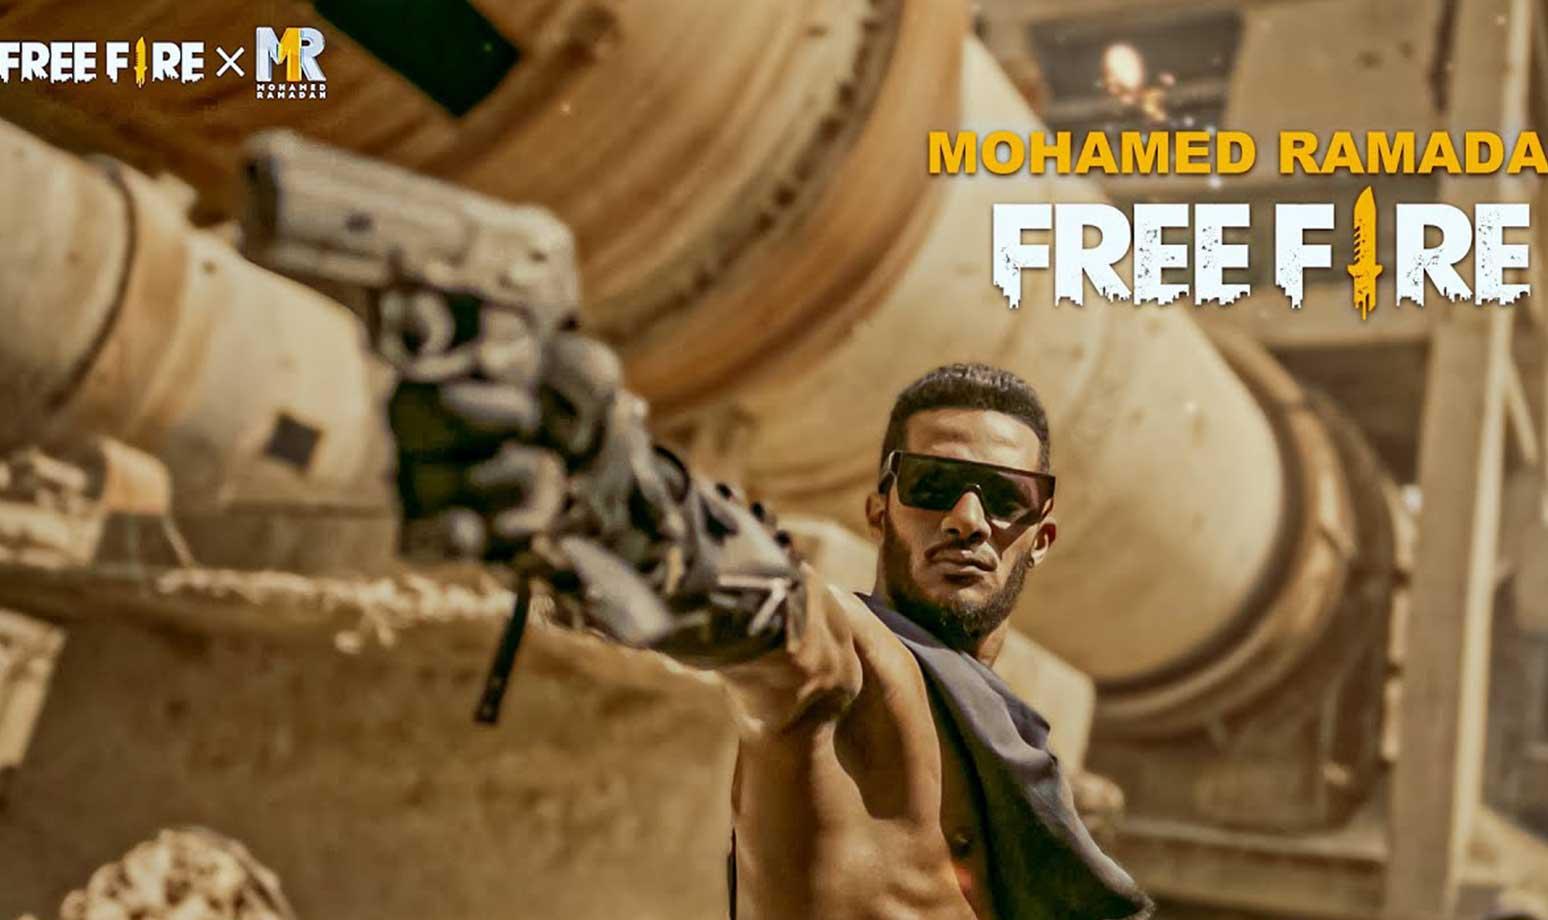 free fire x mohamed ramadan